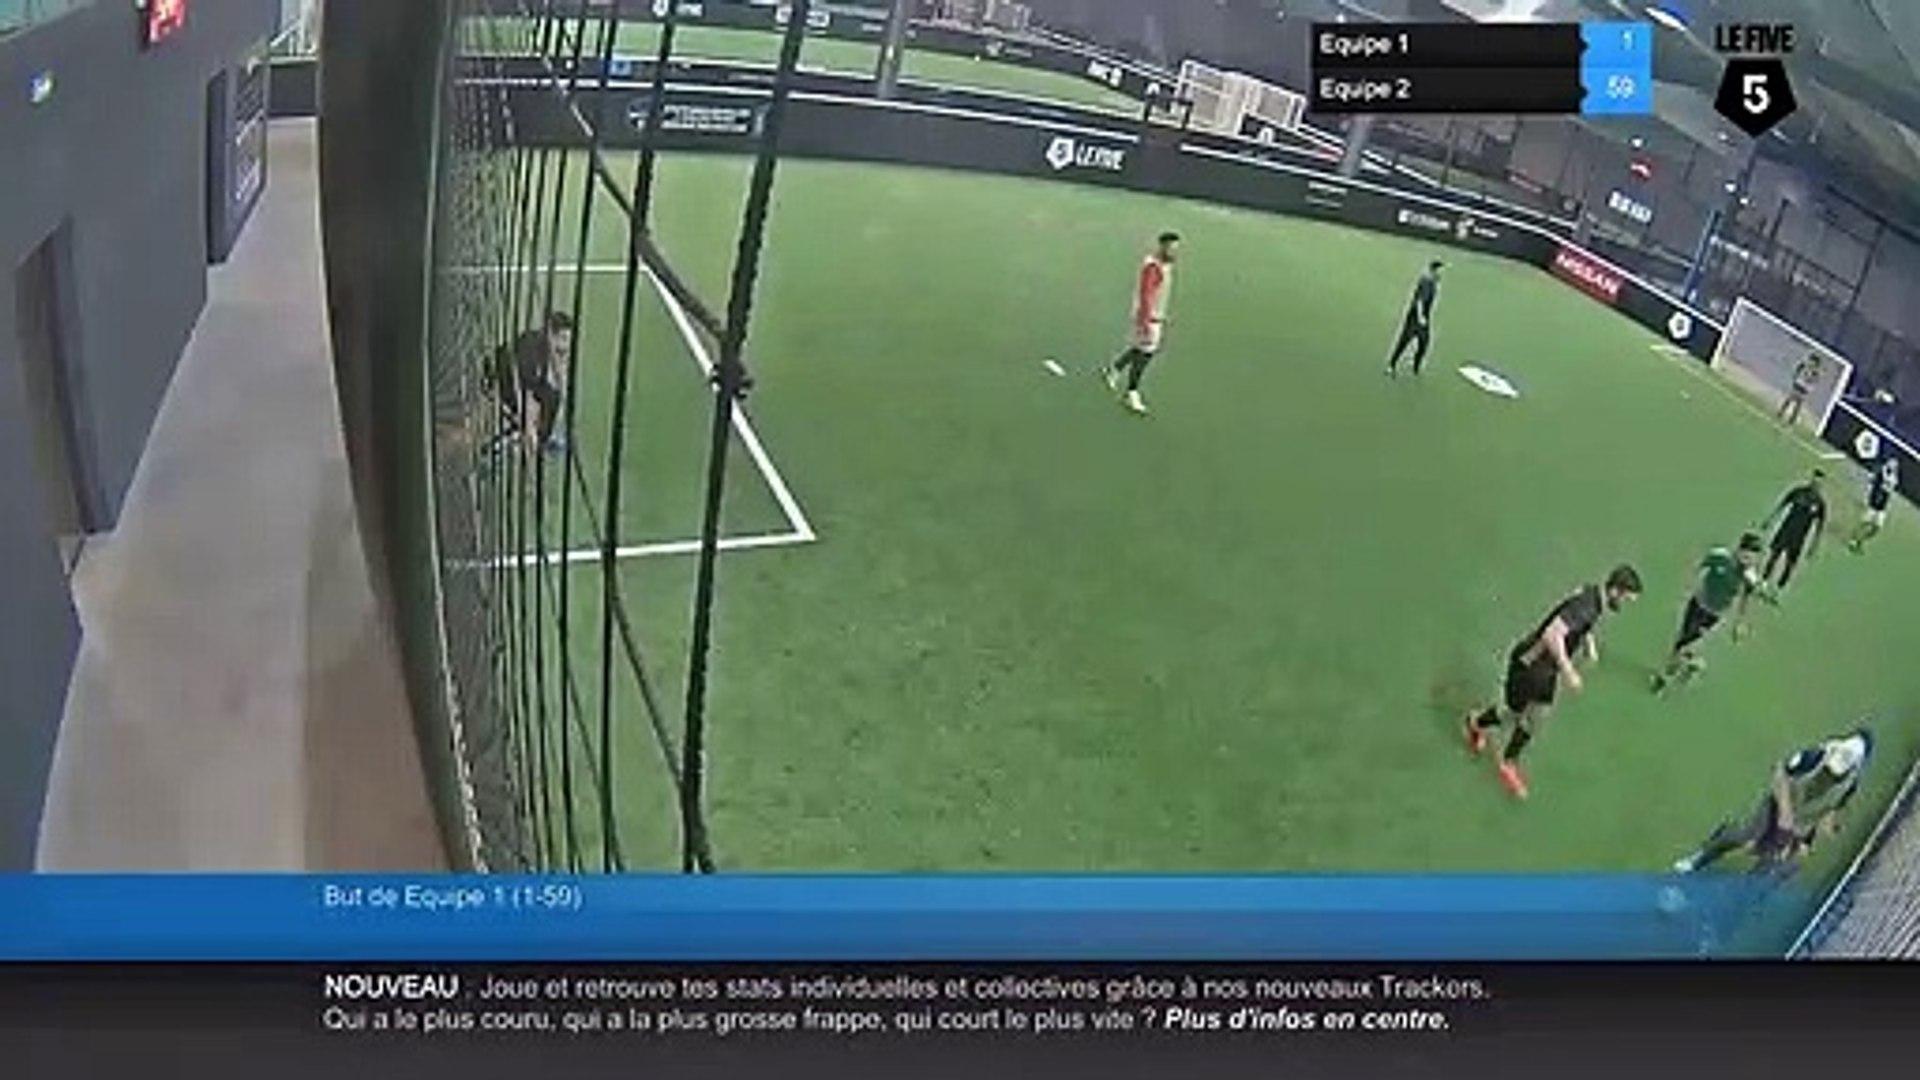 But de Equipe 2 (0-14) - Equipe 1 Vs Equipe 2 - 14/04/19 14:00 - Loisir Mulhouse (LeFive)